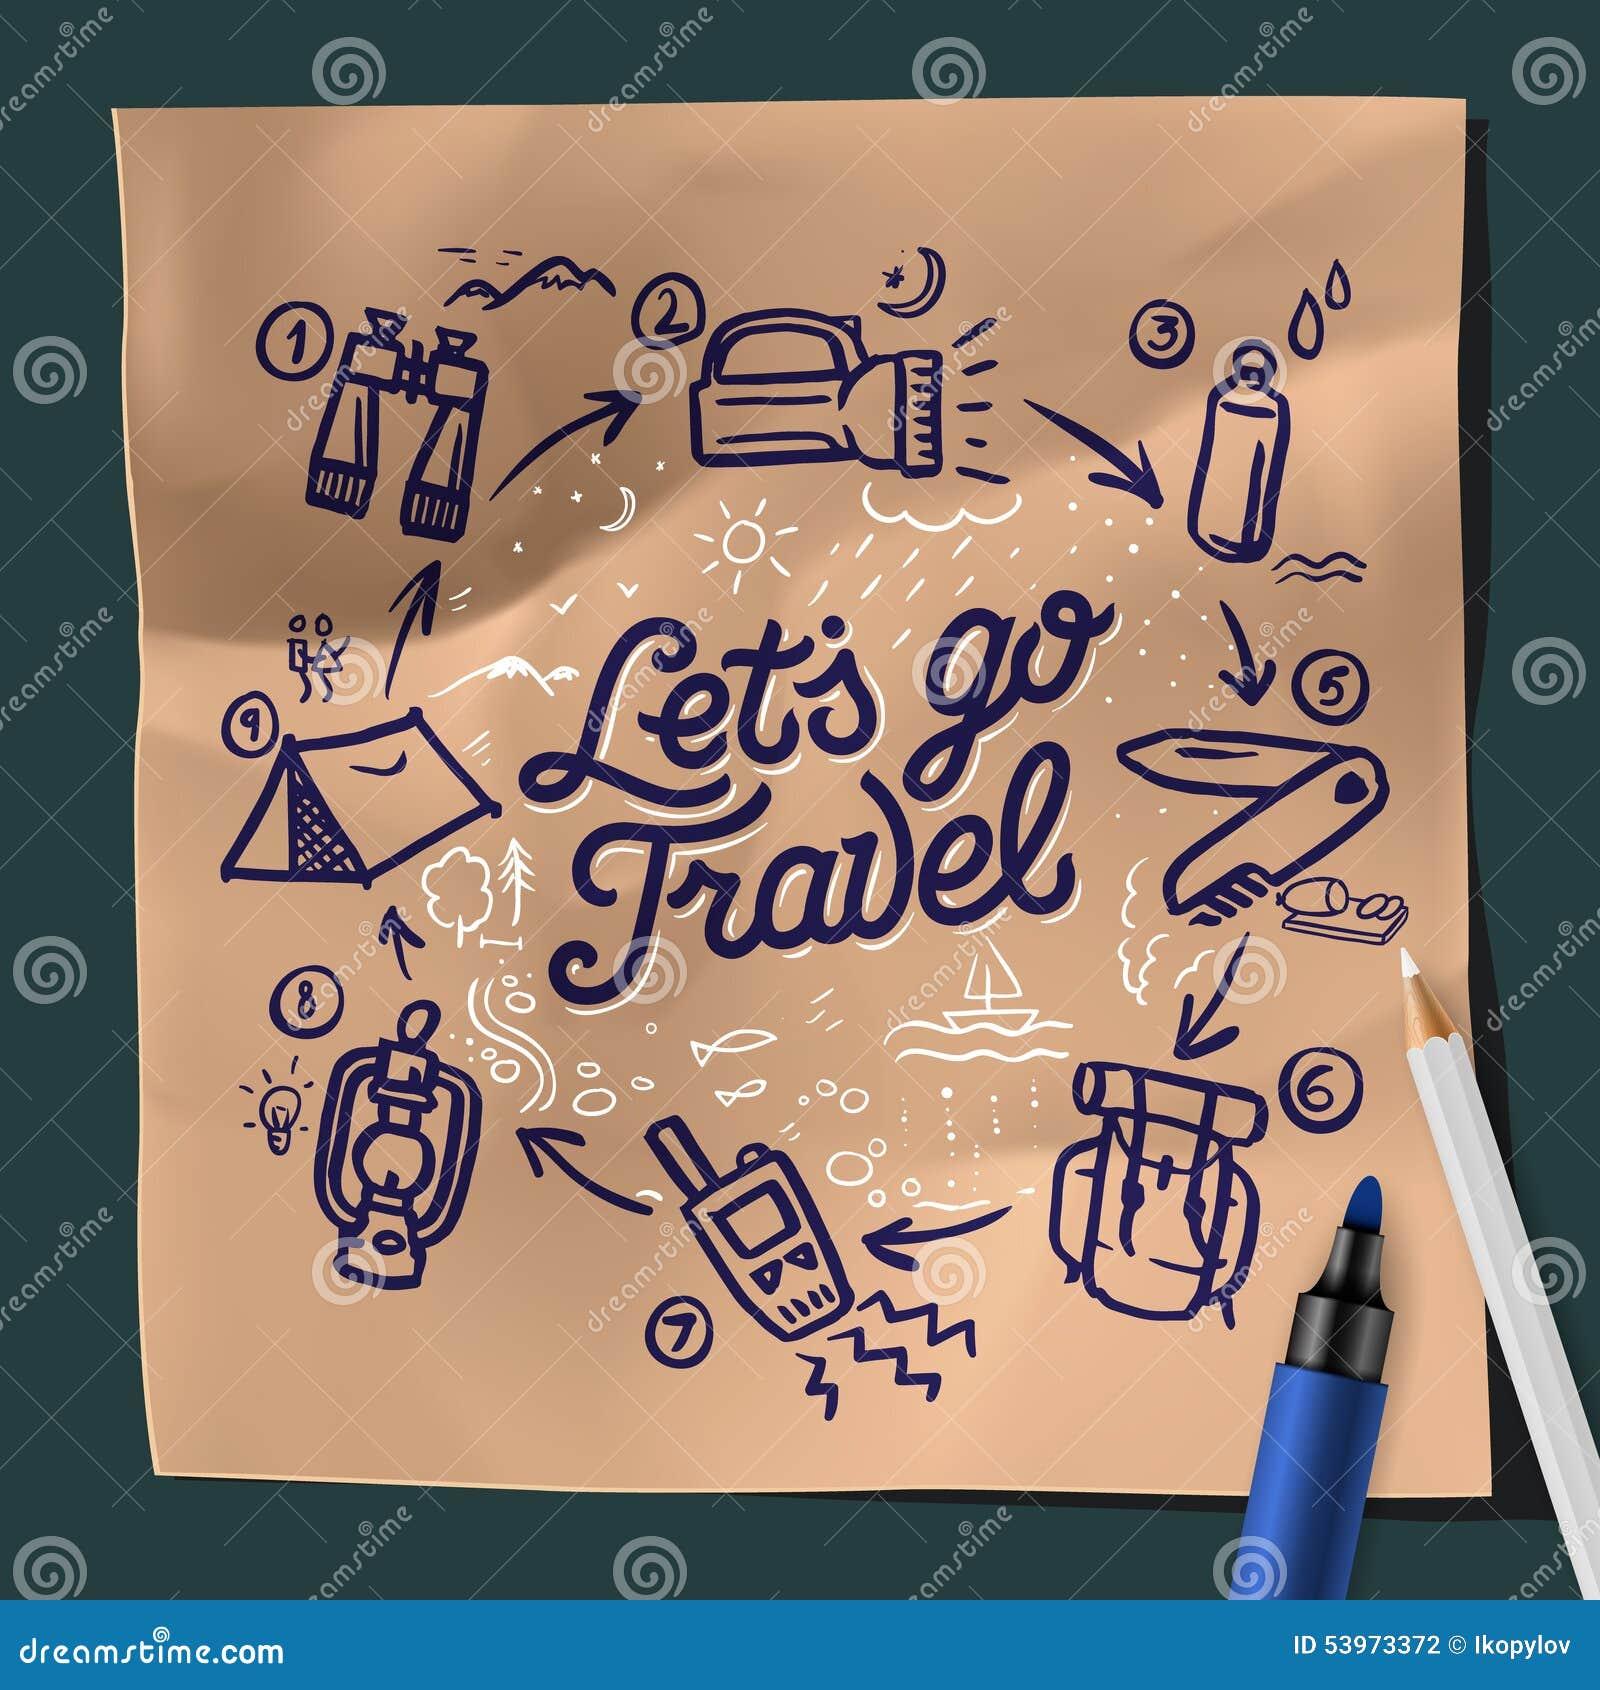 Lets go travel adventure motivation concept stock for Let s go fishing xl